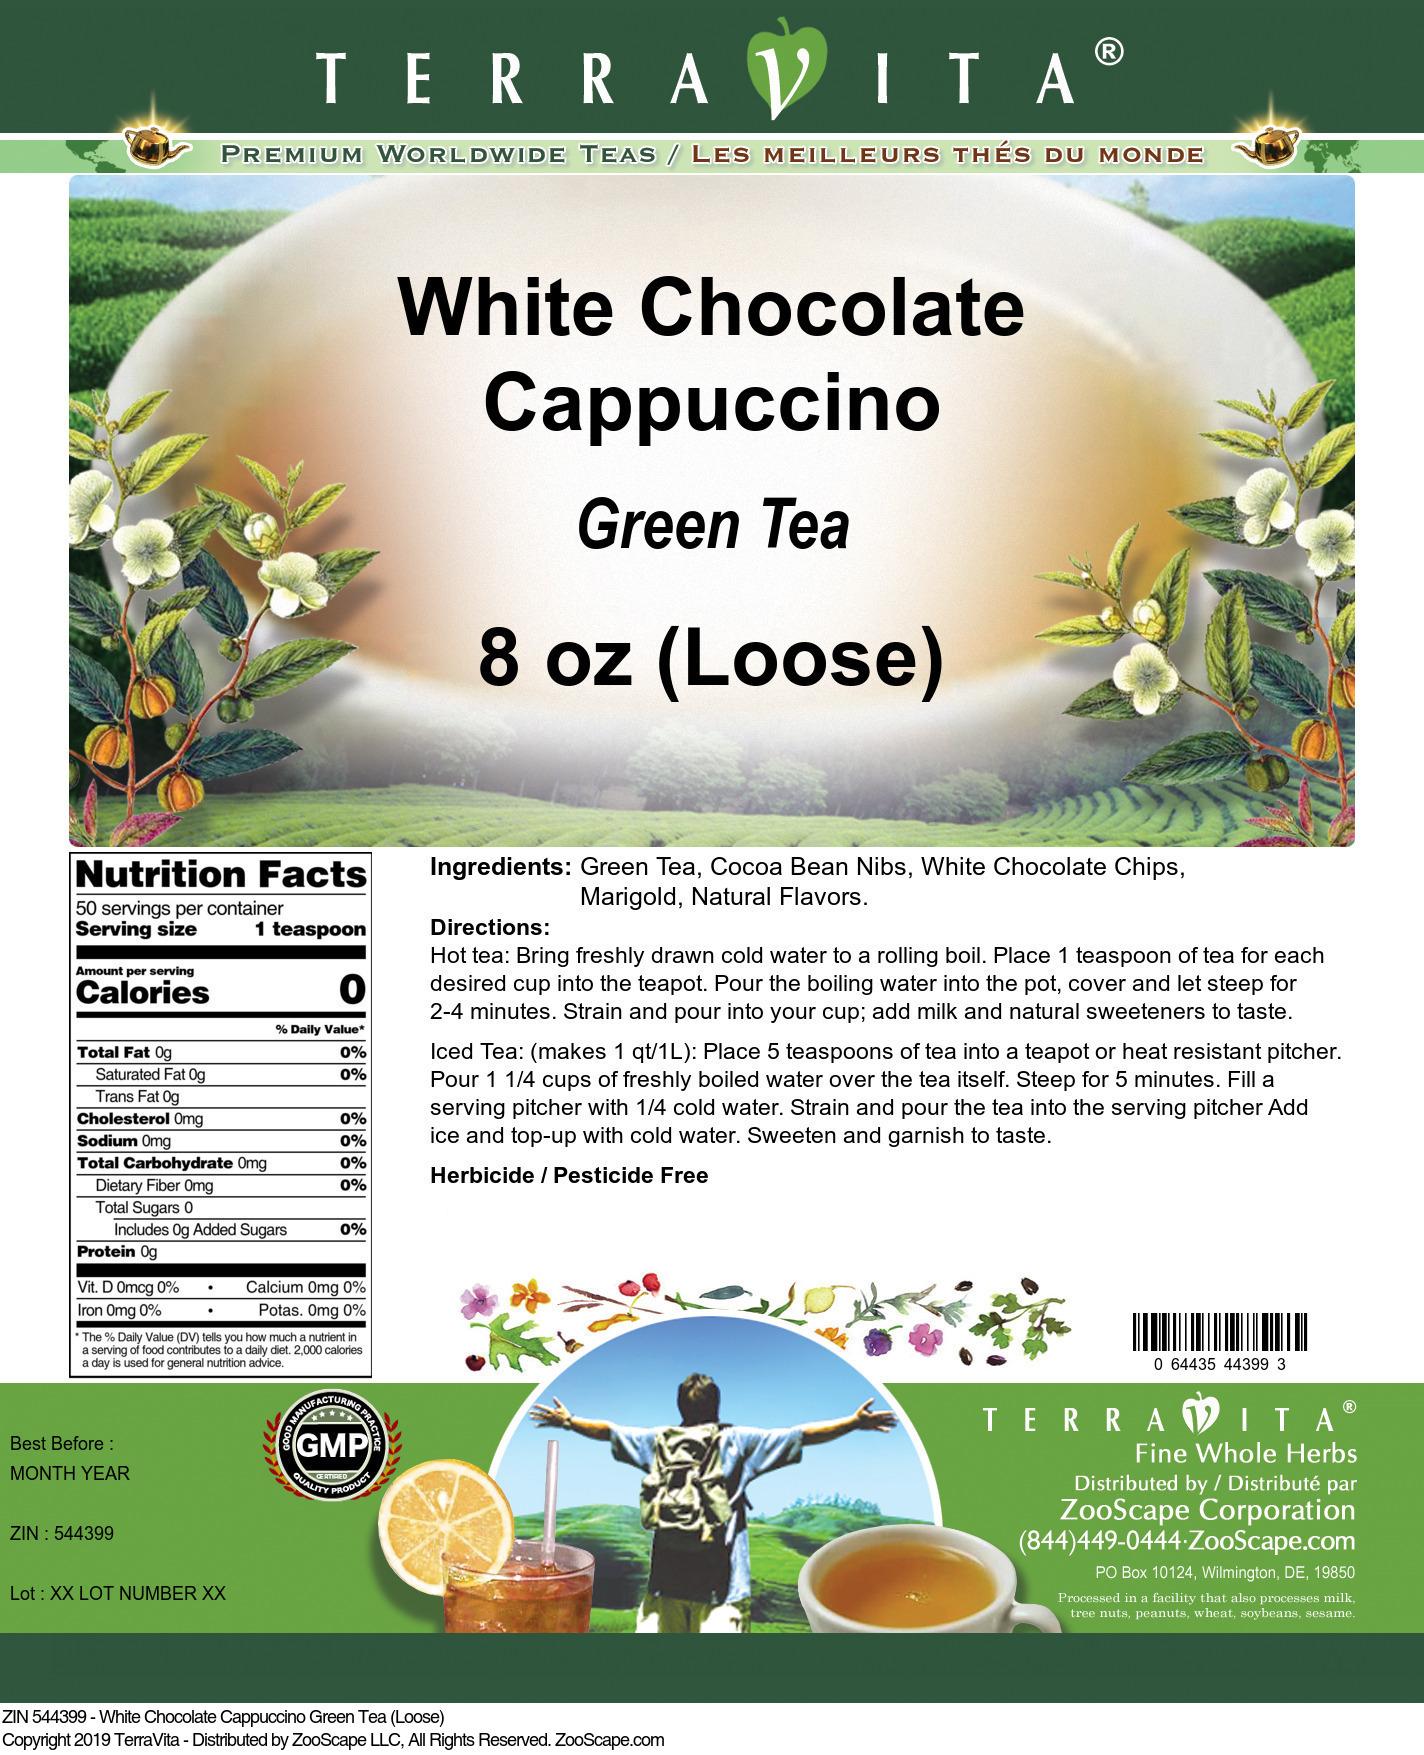 White Chocolate Cappuccino Green Tea (Loose)